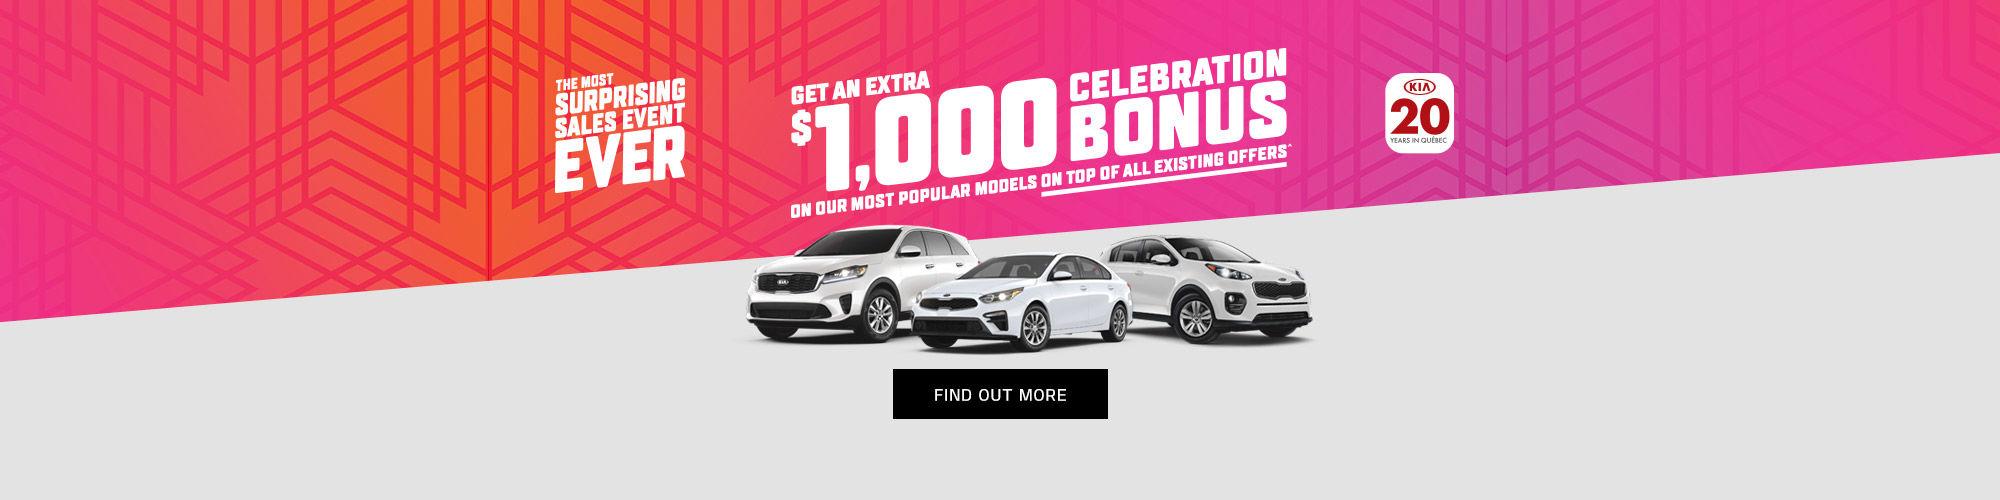 Kia's most surprising Sales Event Ever